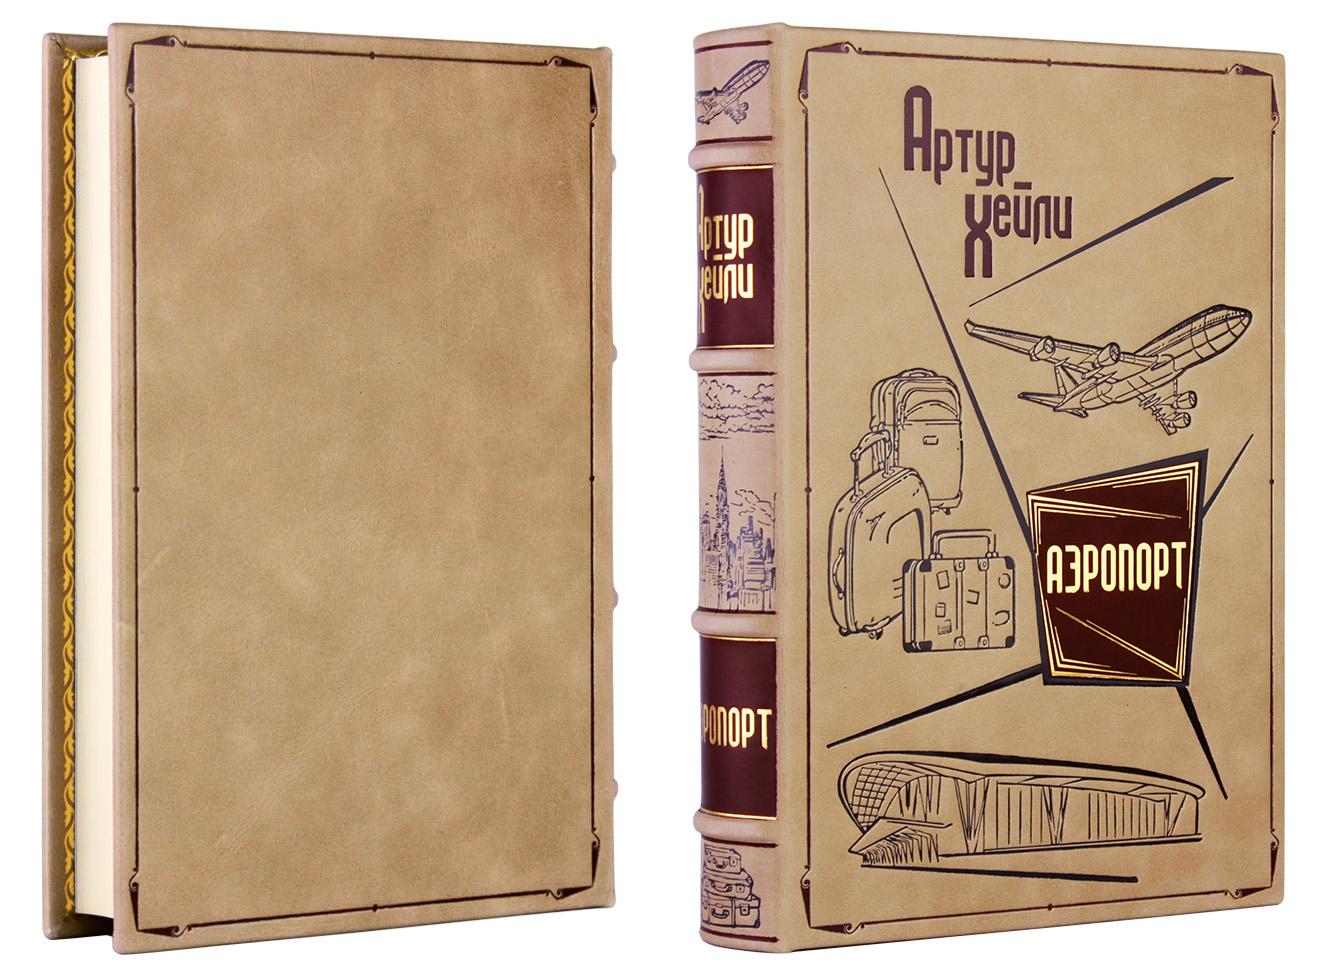 Артур Хейли, книга Аэропорт, кожаный переплет